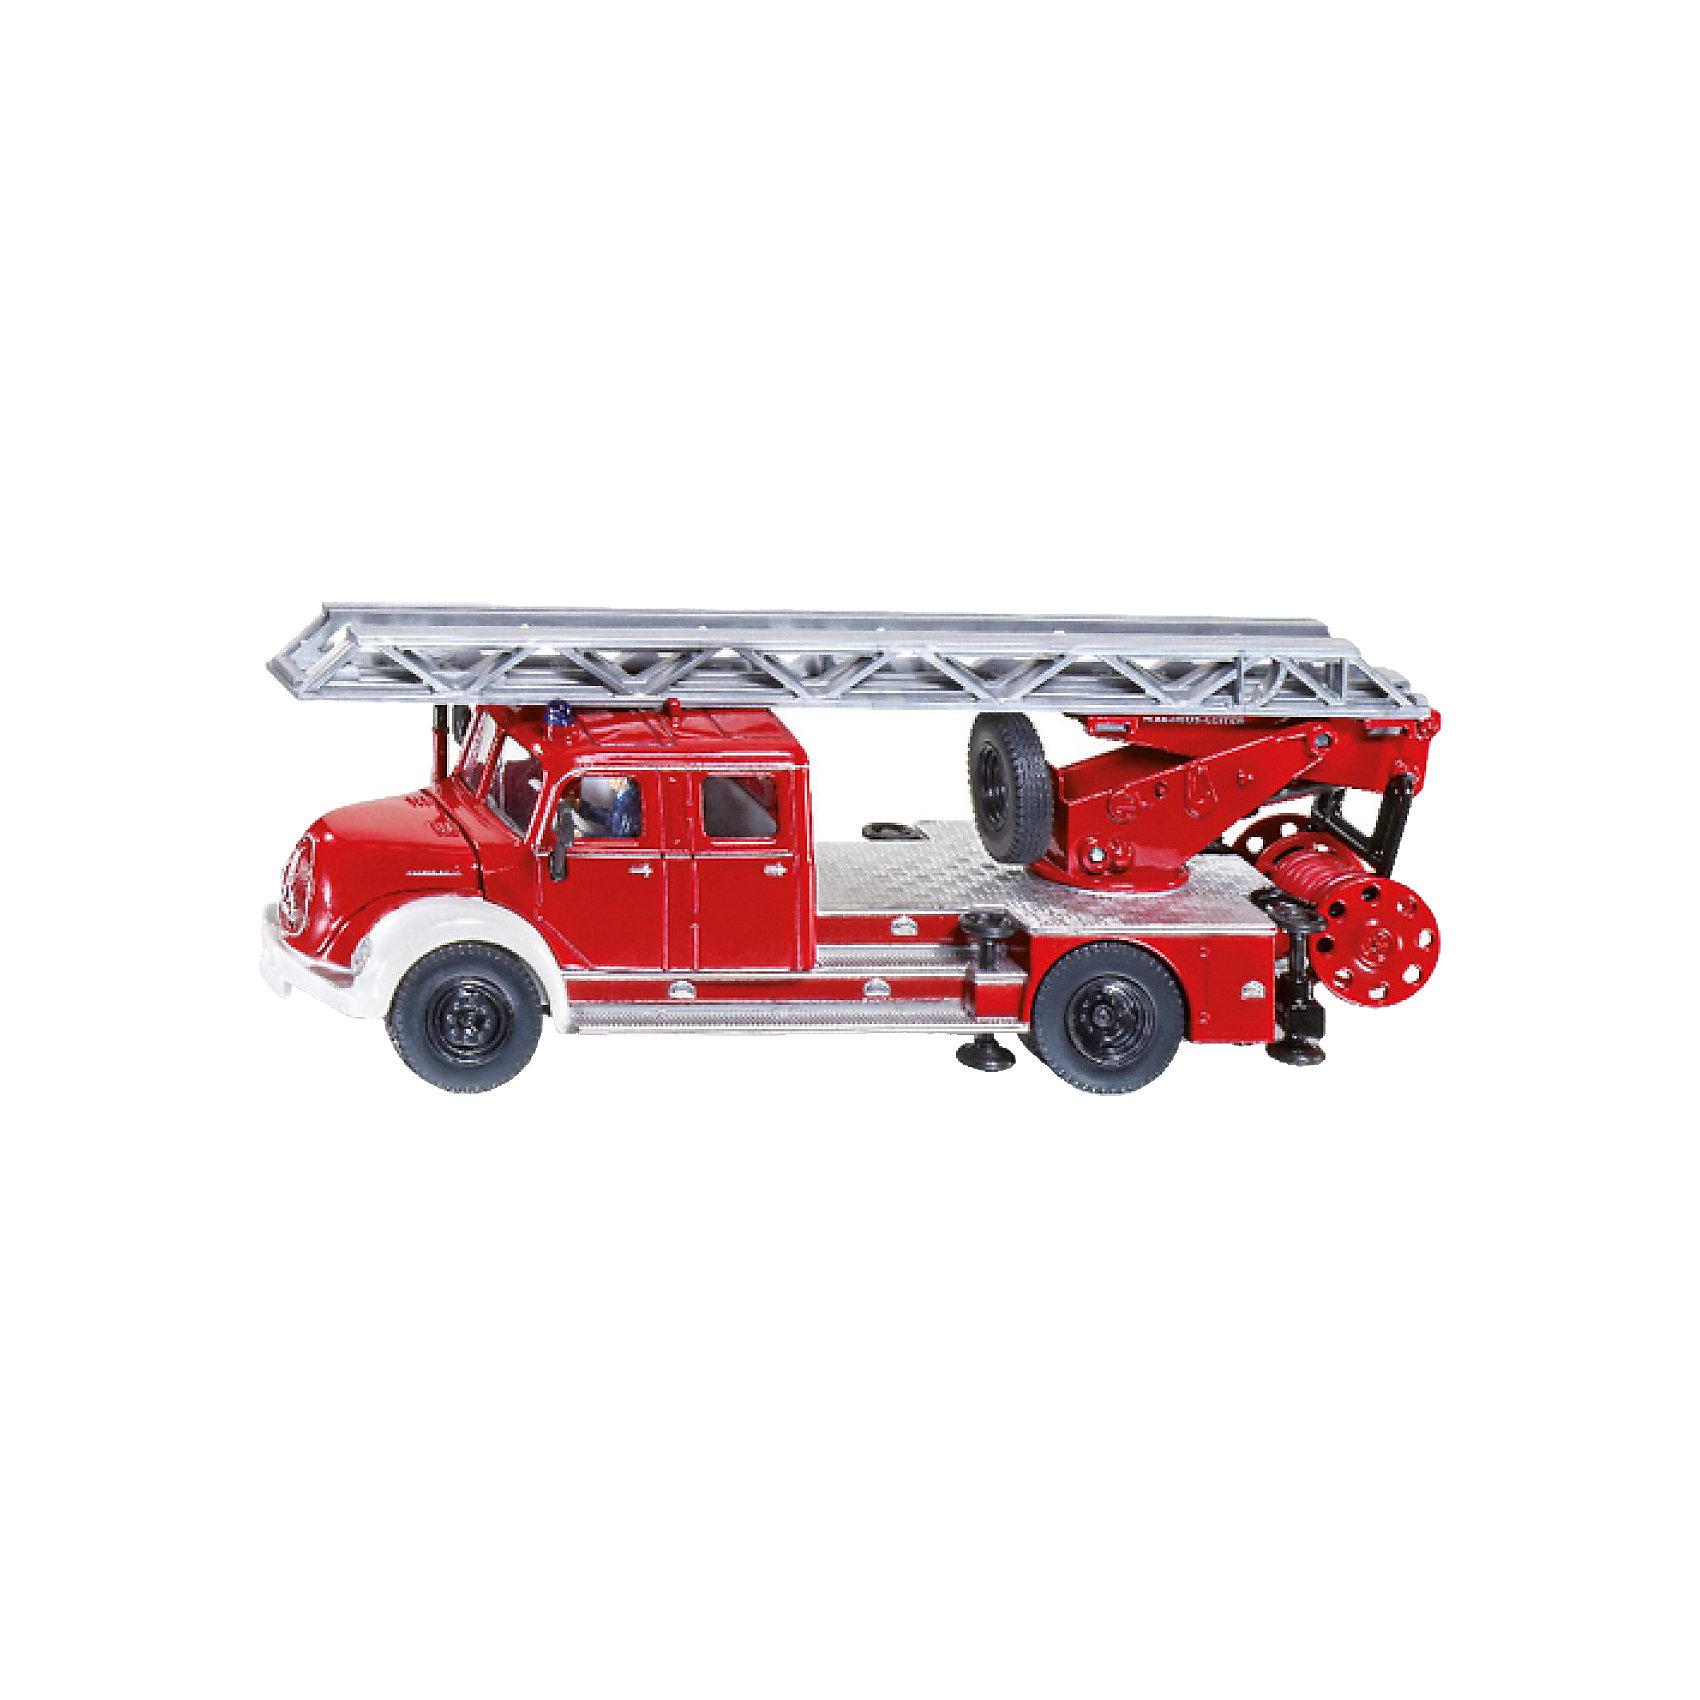 SIKU 4114 Пожарная машина с лестницей Magirus 1:50